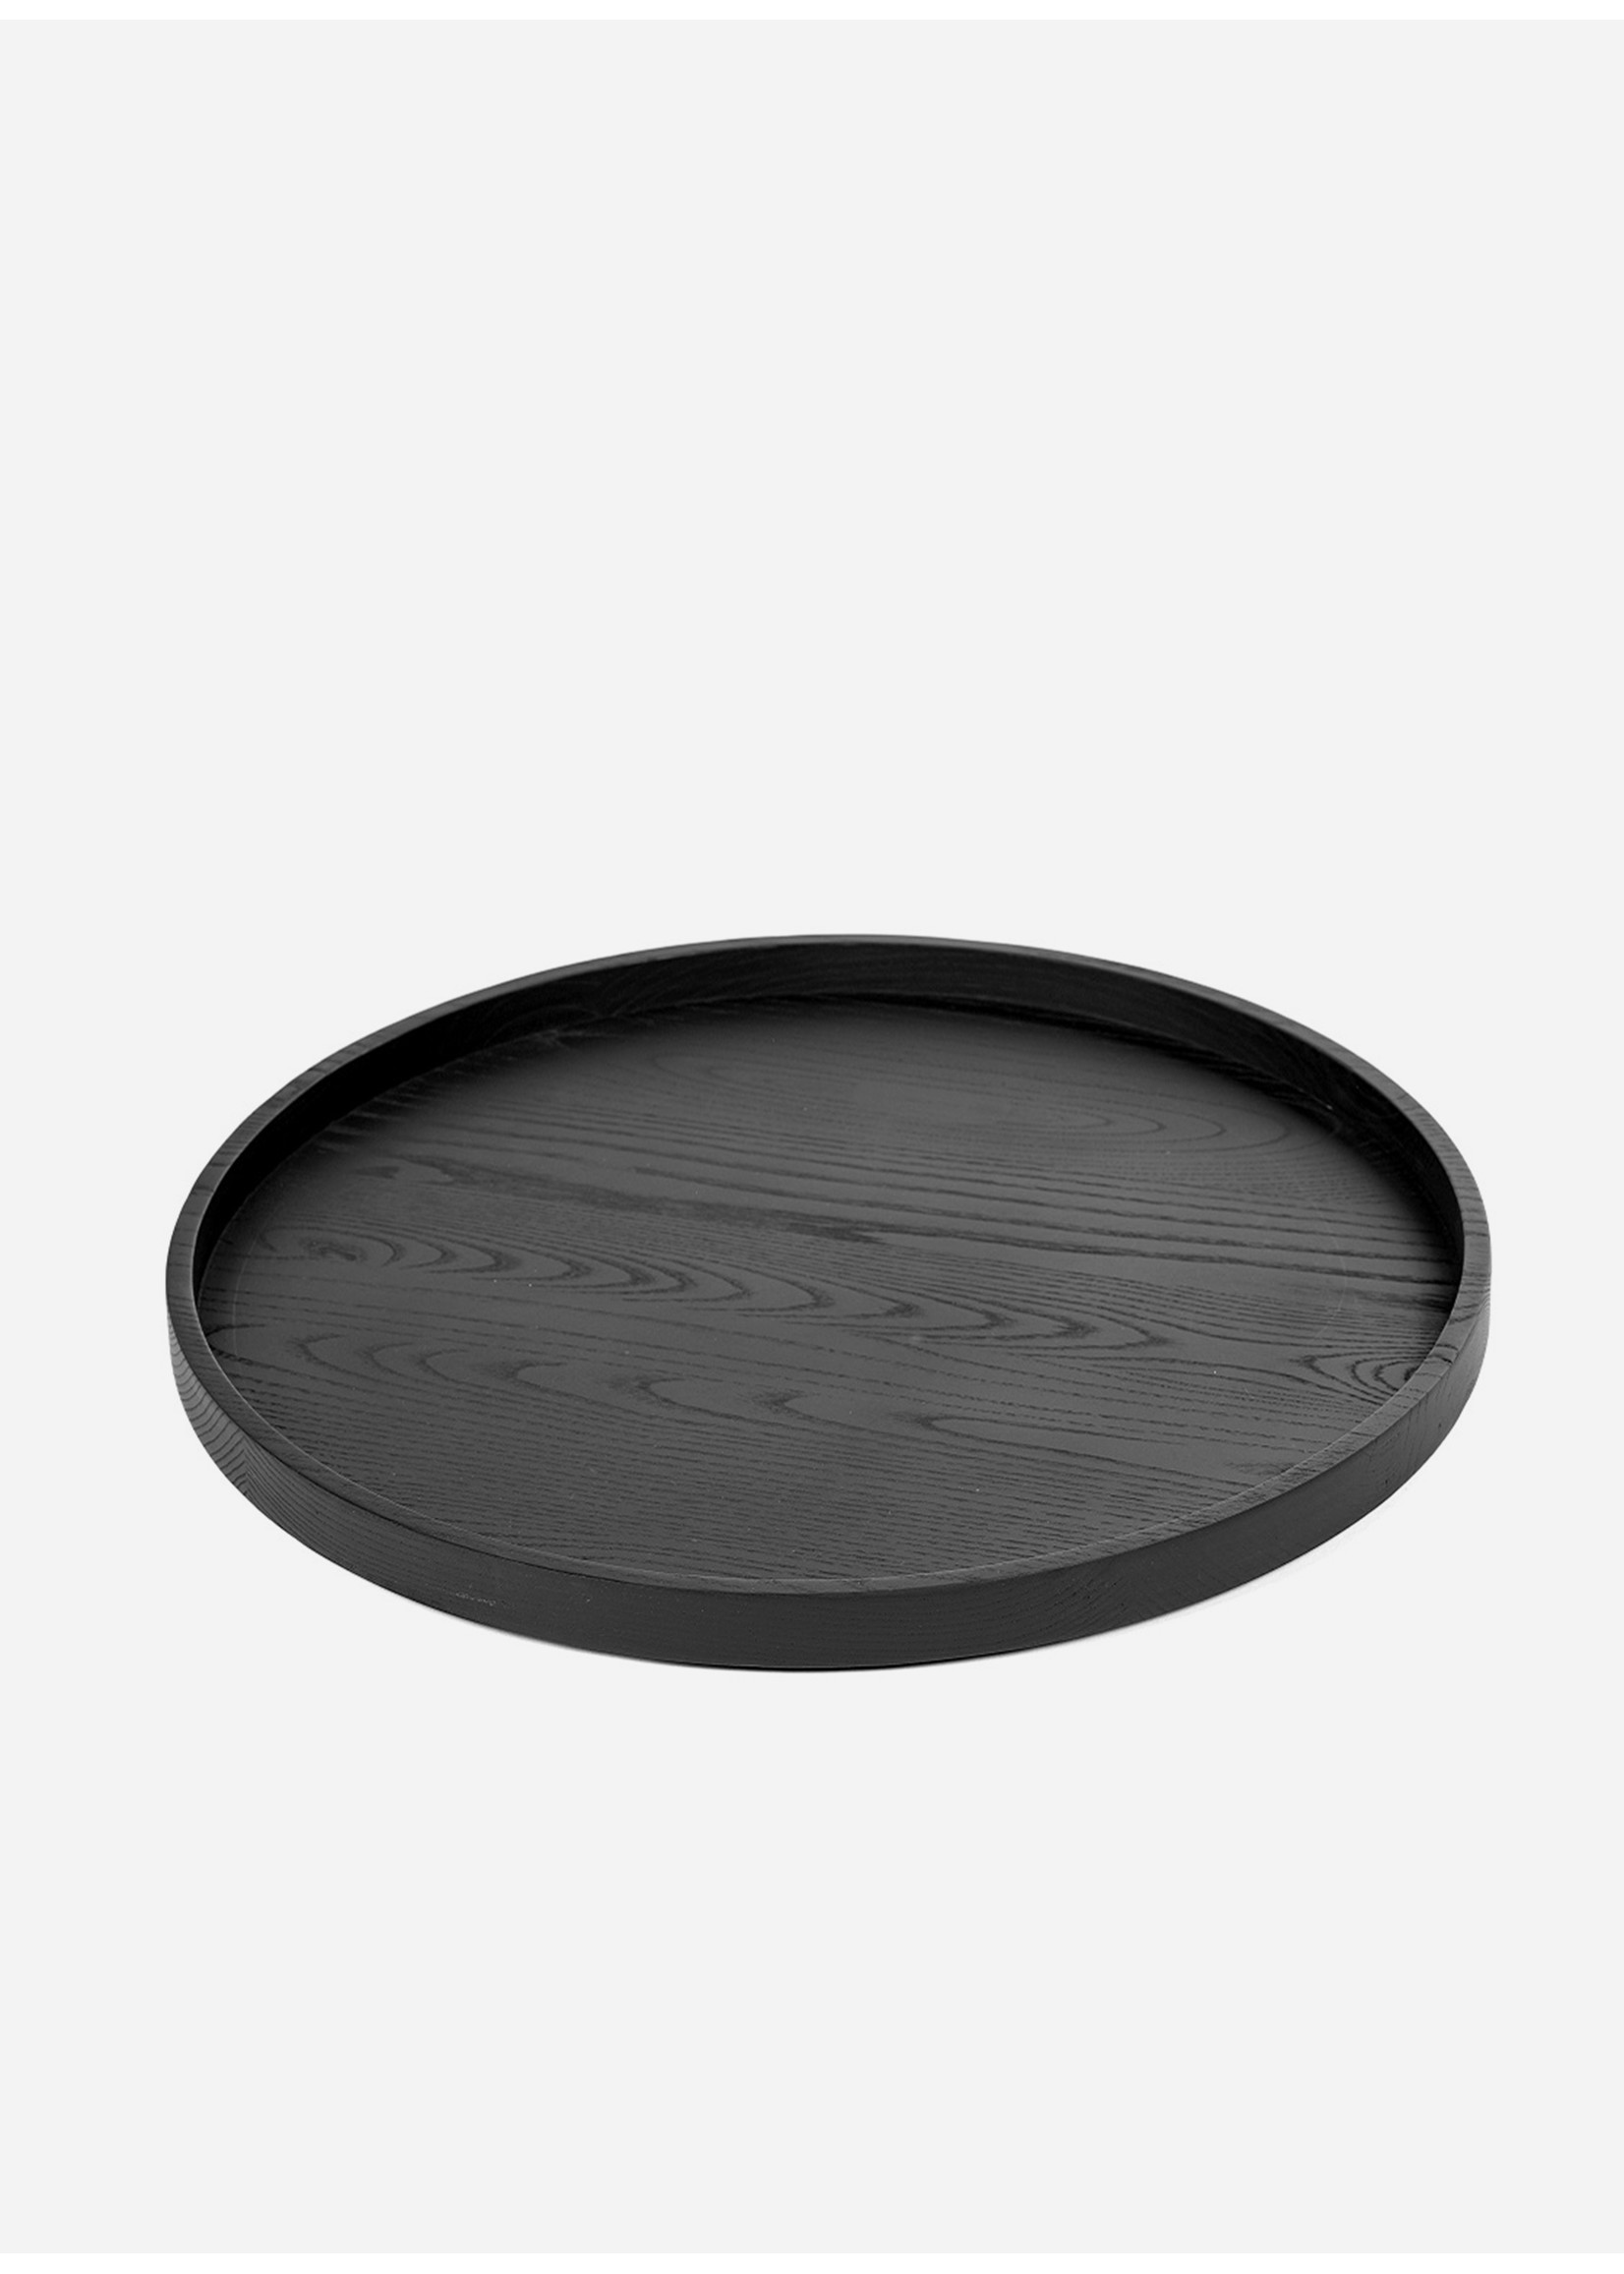 Serax Vincent van Duysen x Serax tray wood round